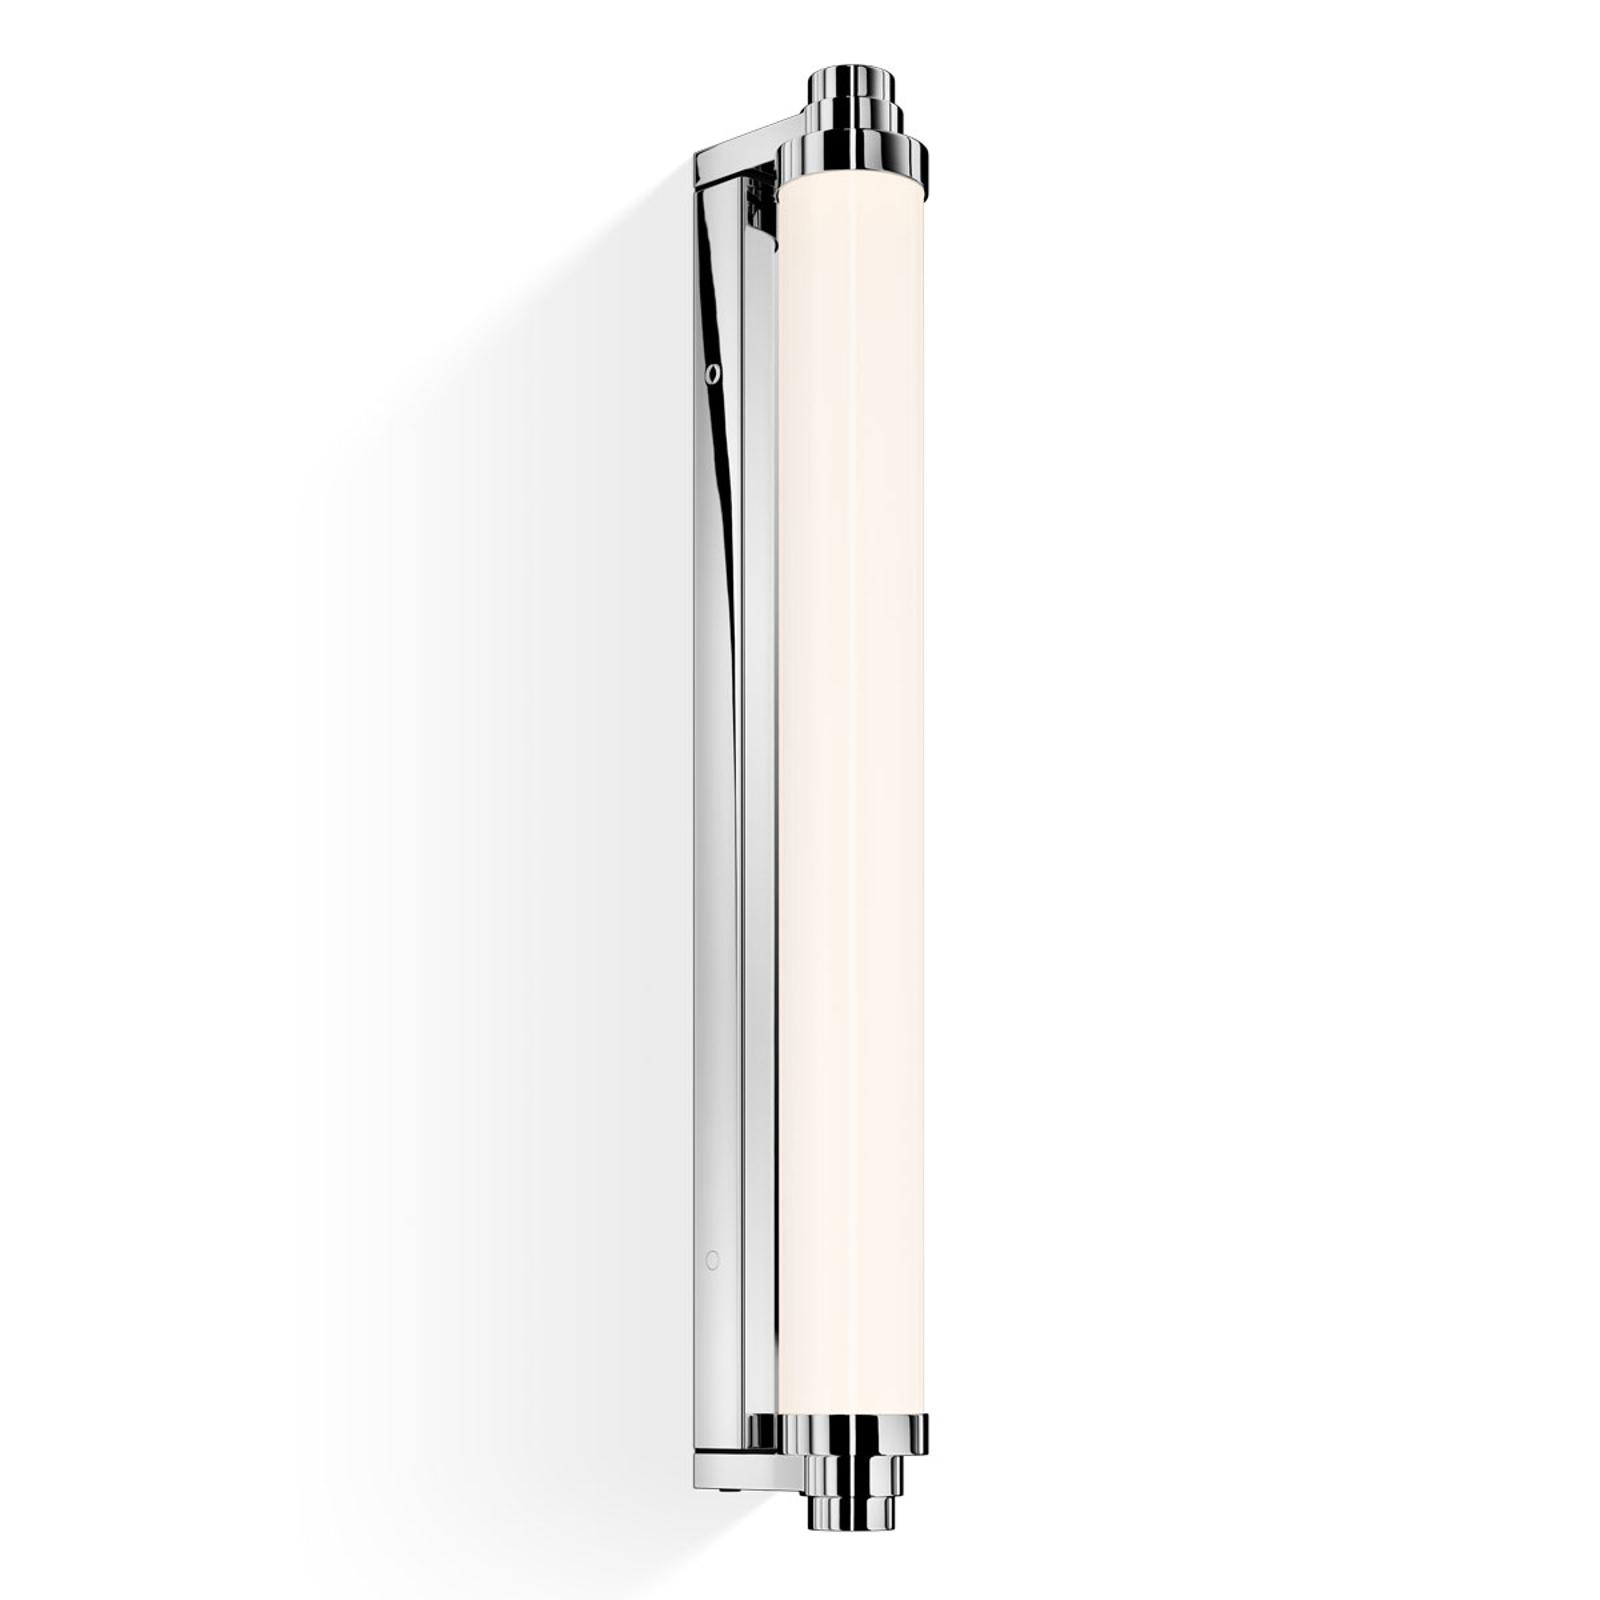 Decor Walther Vienna vägglampa 60 cm